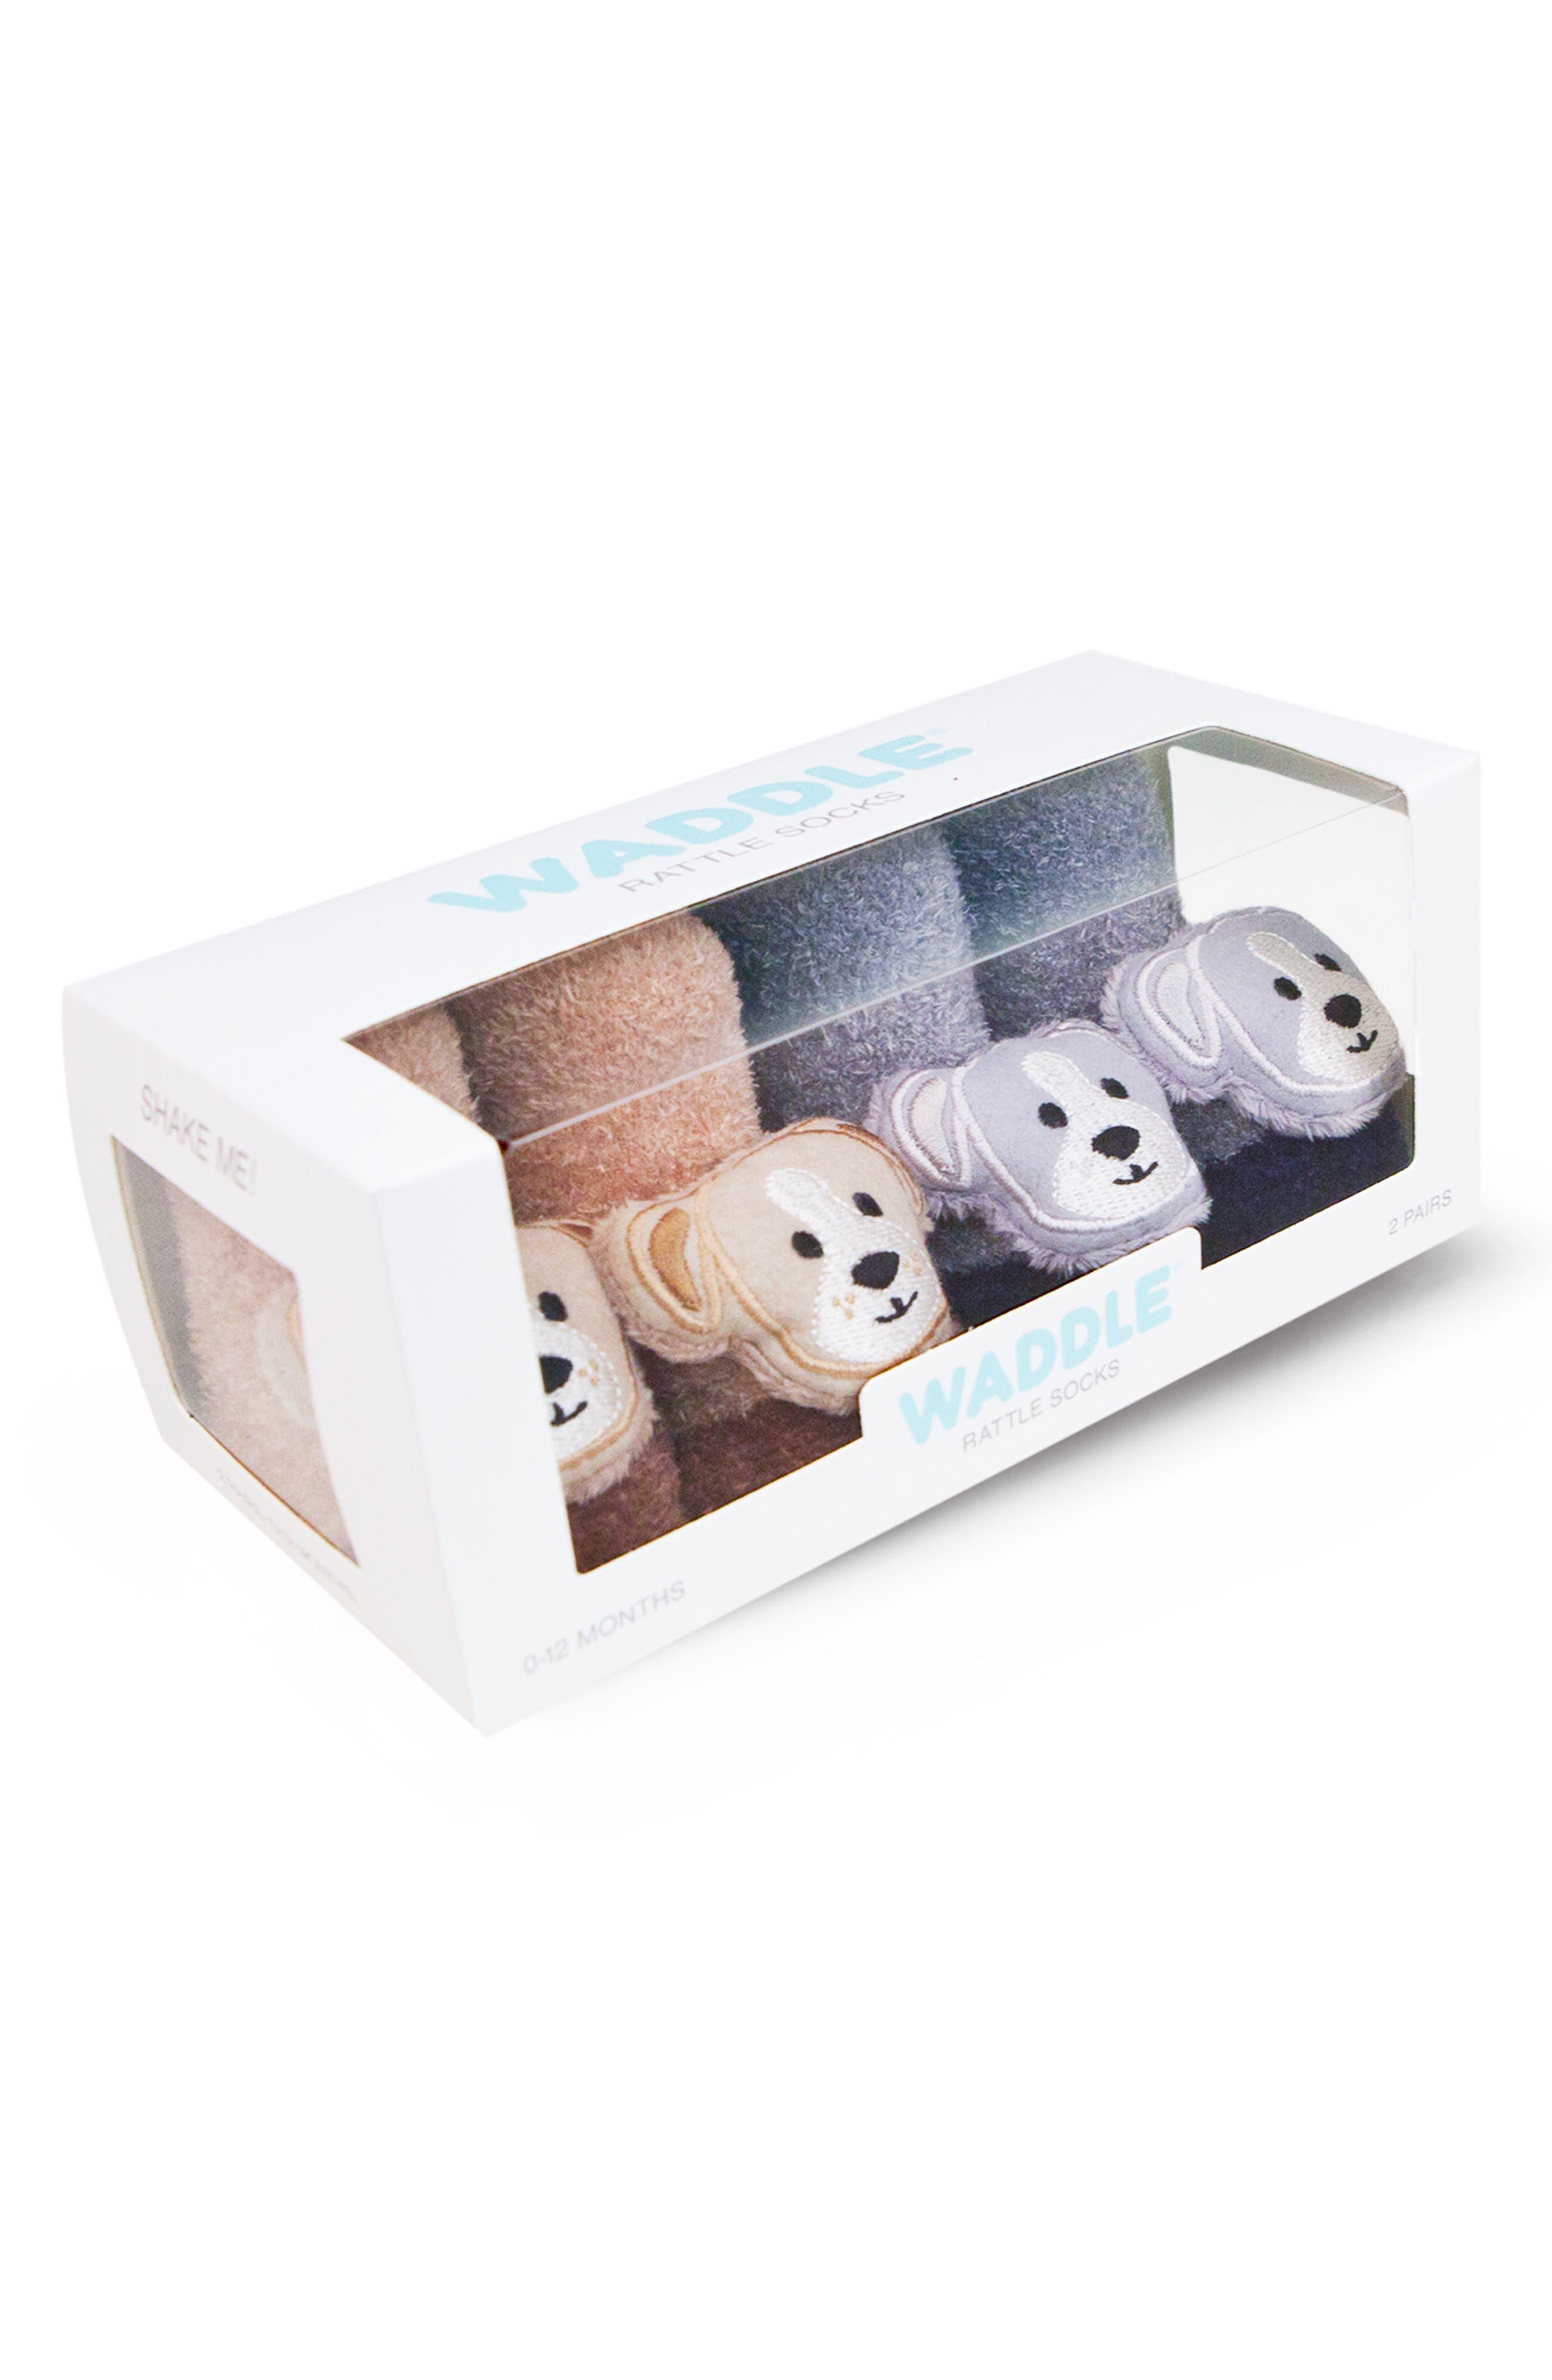 2-Pack Animal Rattle Socks,                             Alternate thumbnail 2, color,                             BROWN/ GREY